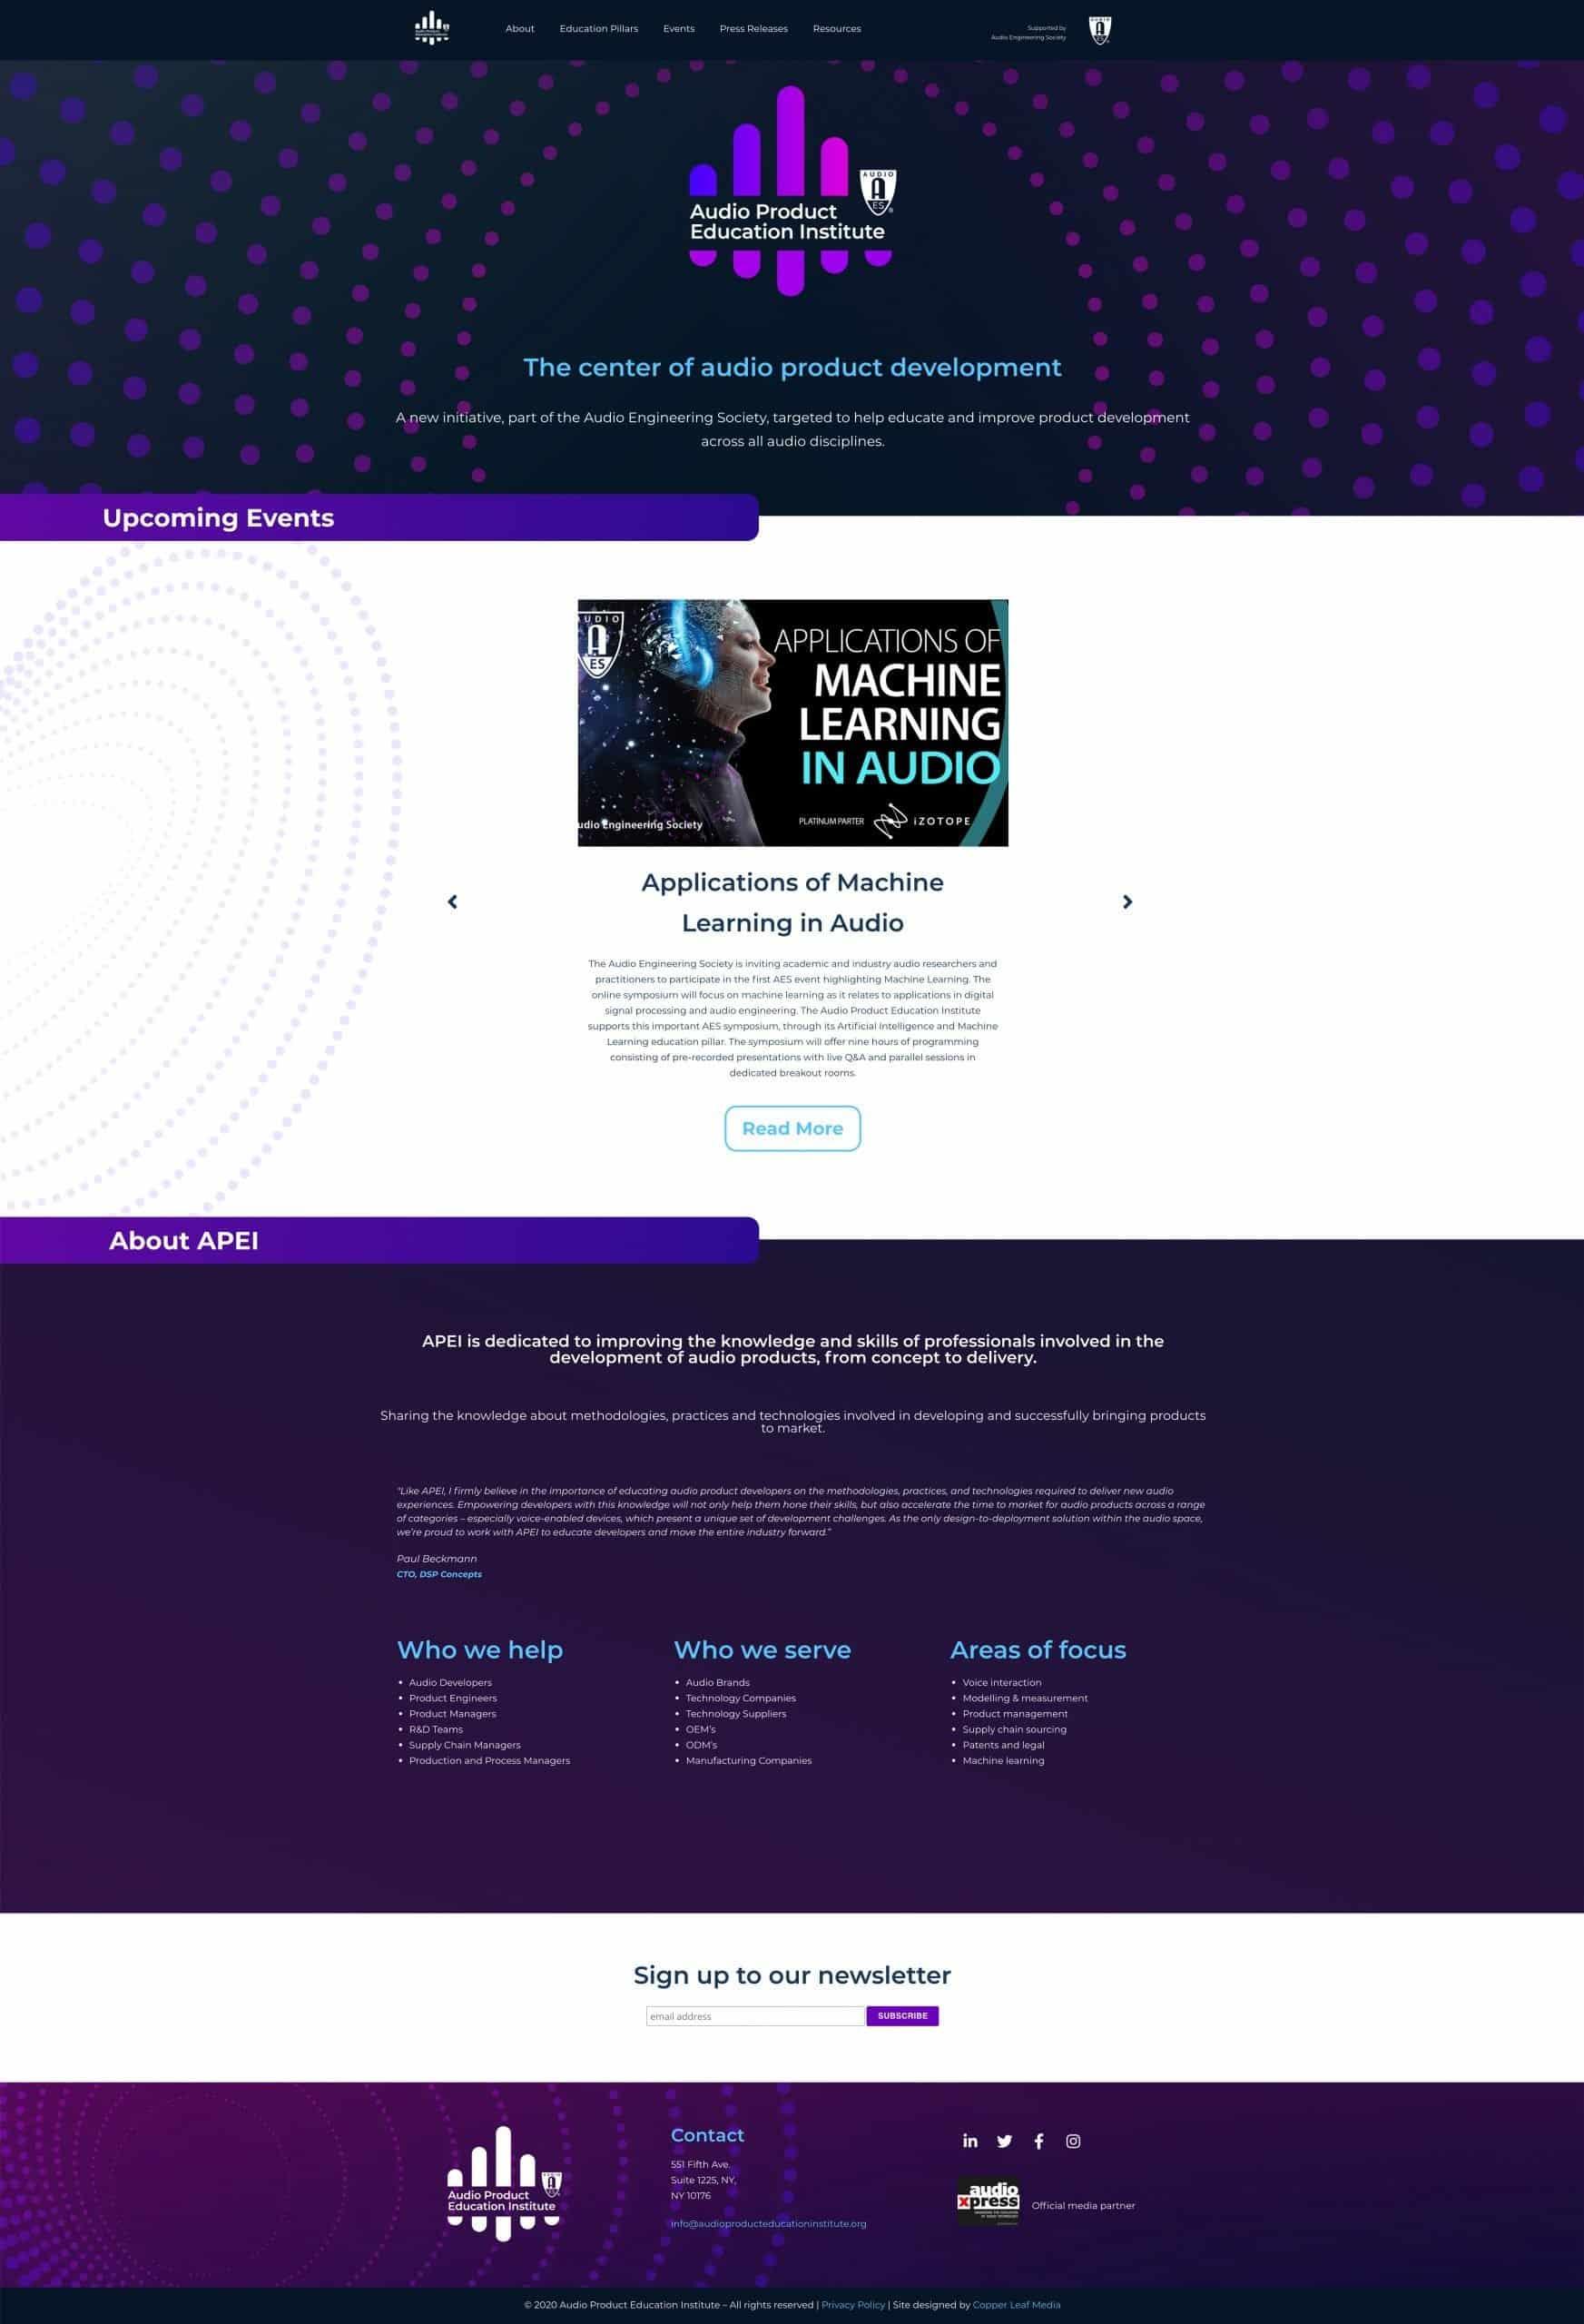 APEI Website